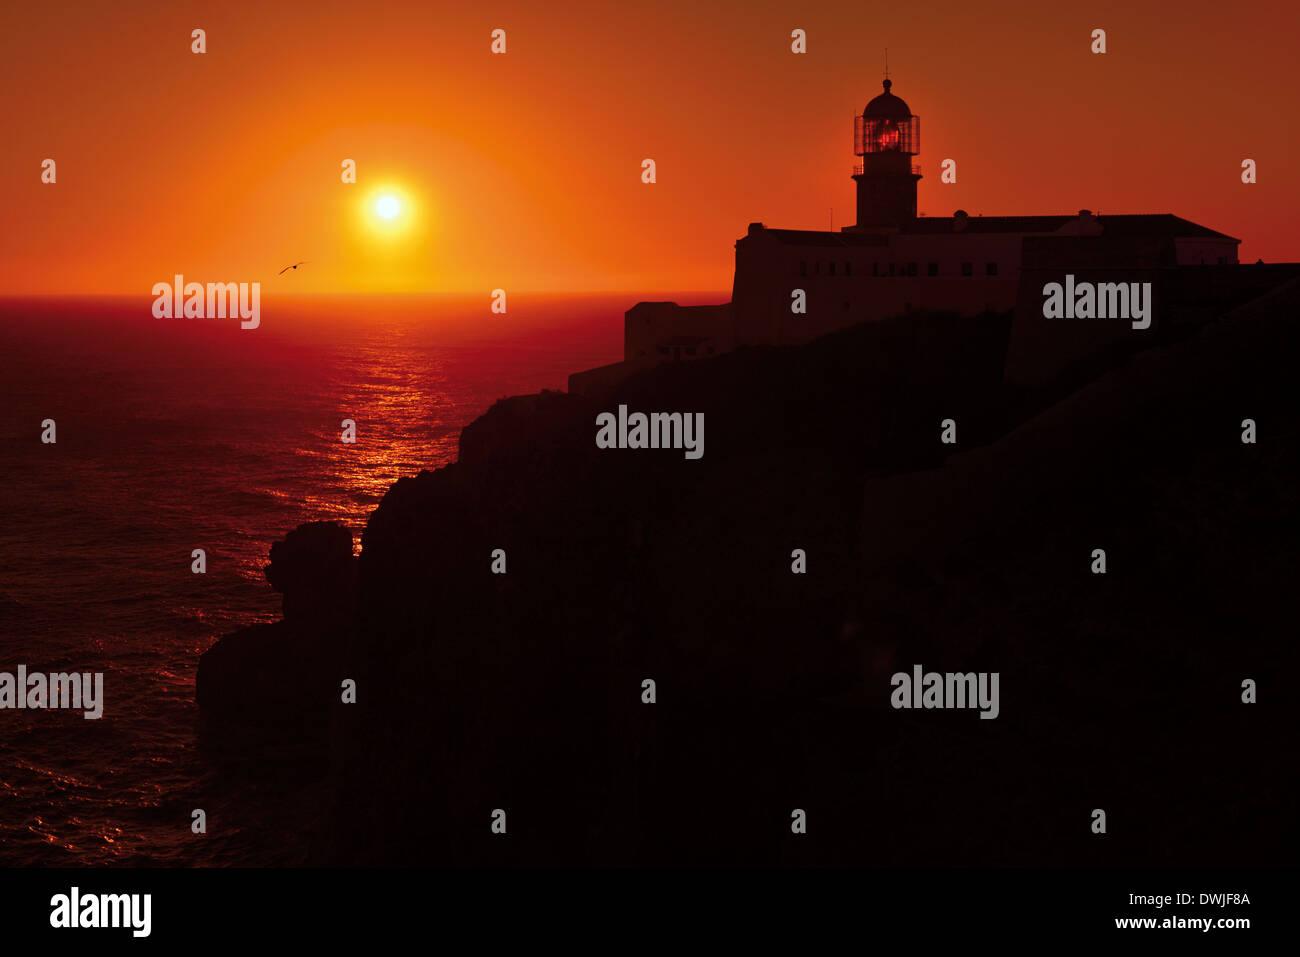 Portugal, Algarve: Sundown at the lighthouse of Cape St. Vincent - Stock Image